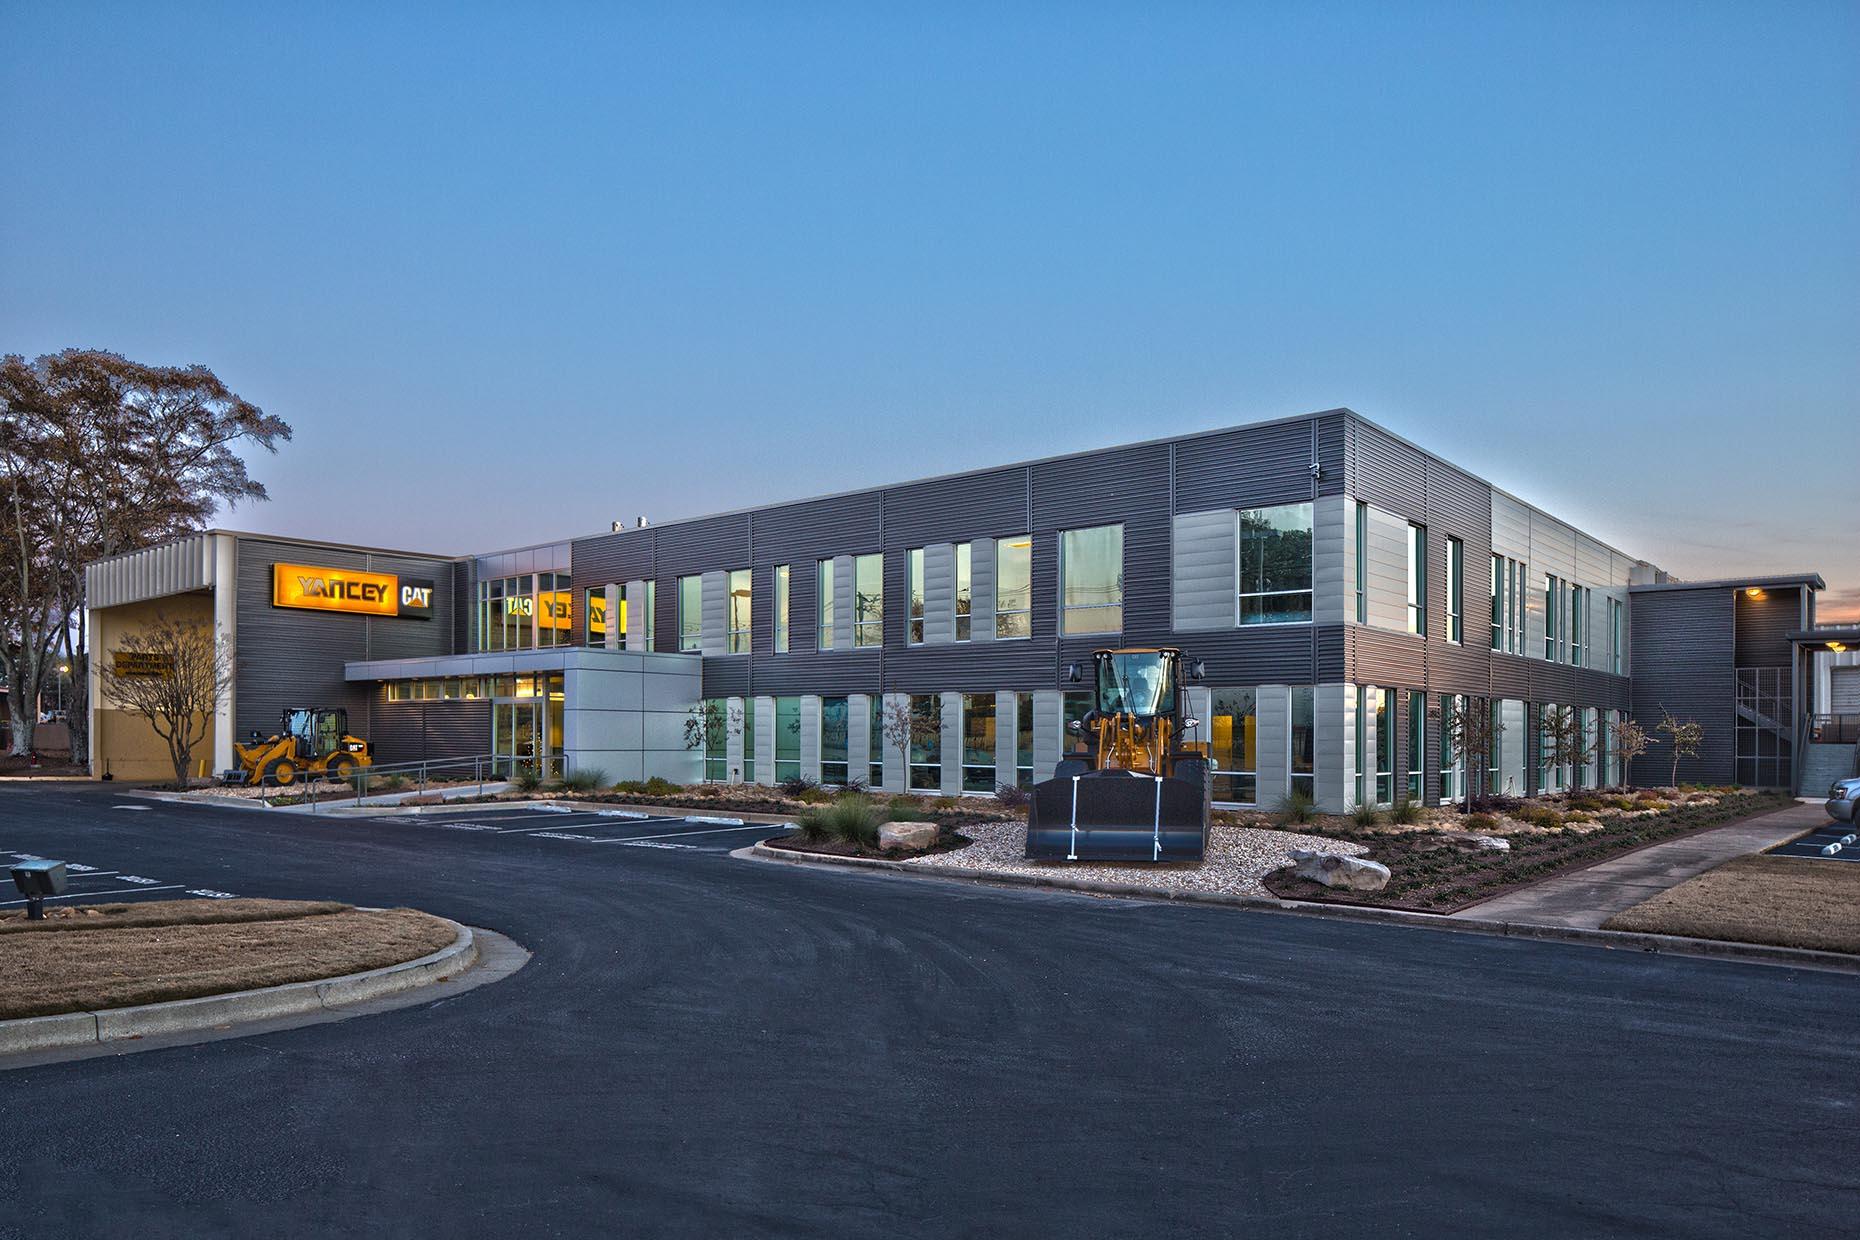 Yancey Caterpillar - Atlanta, GA // Client: Corbin Design Group (Teamed with Creative Sources Photography)